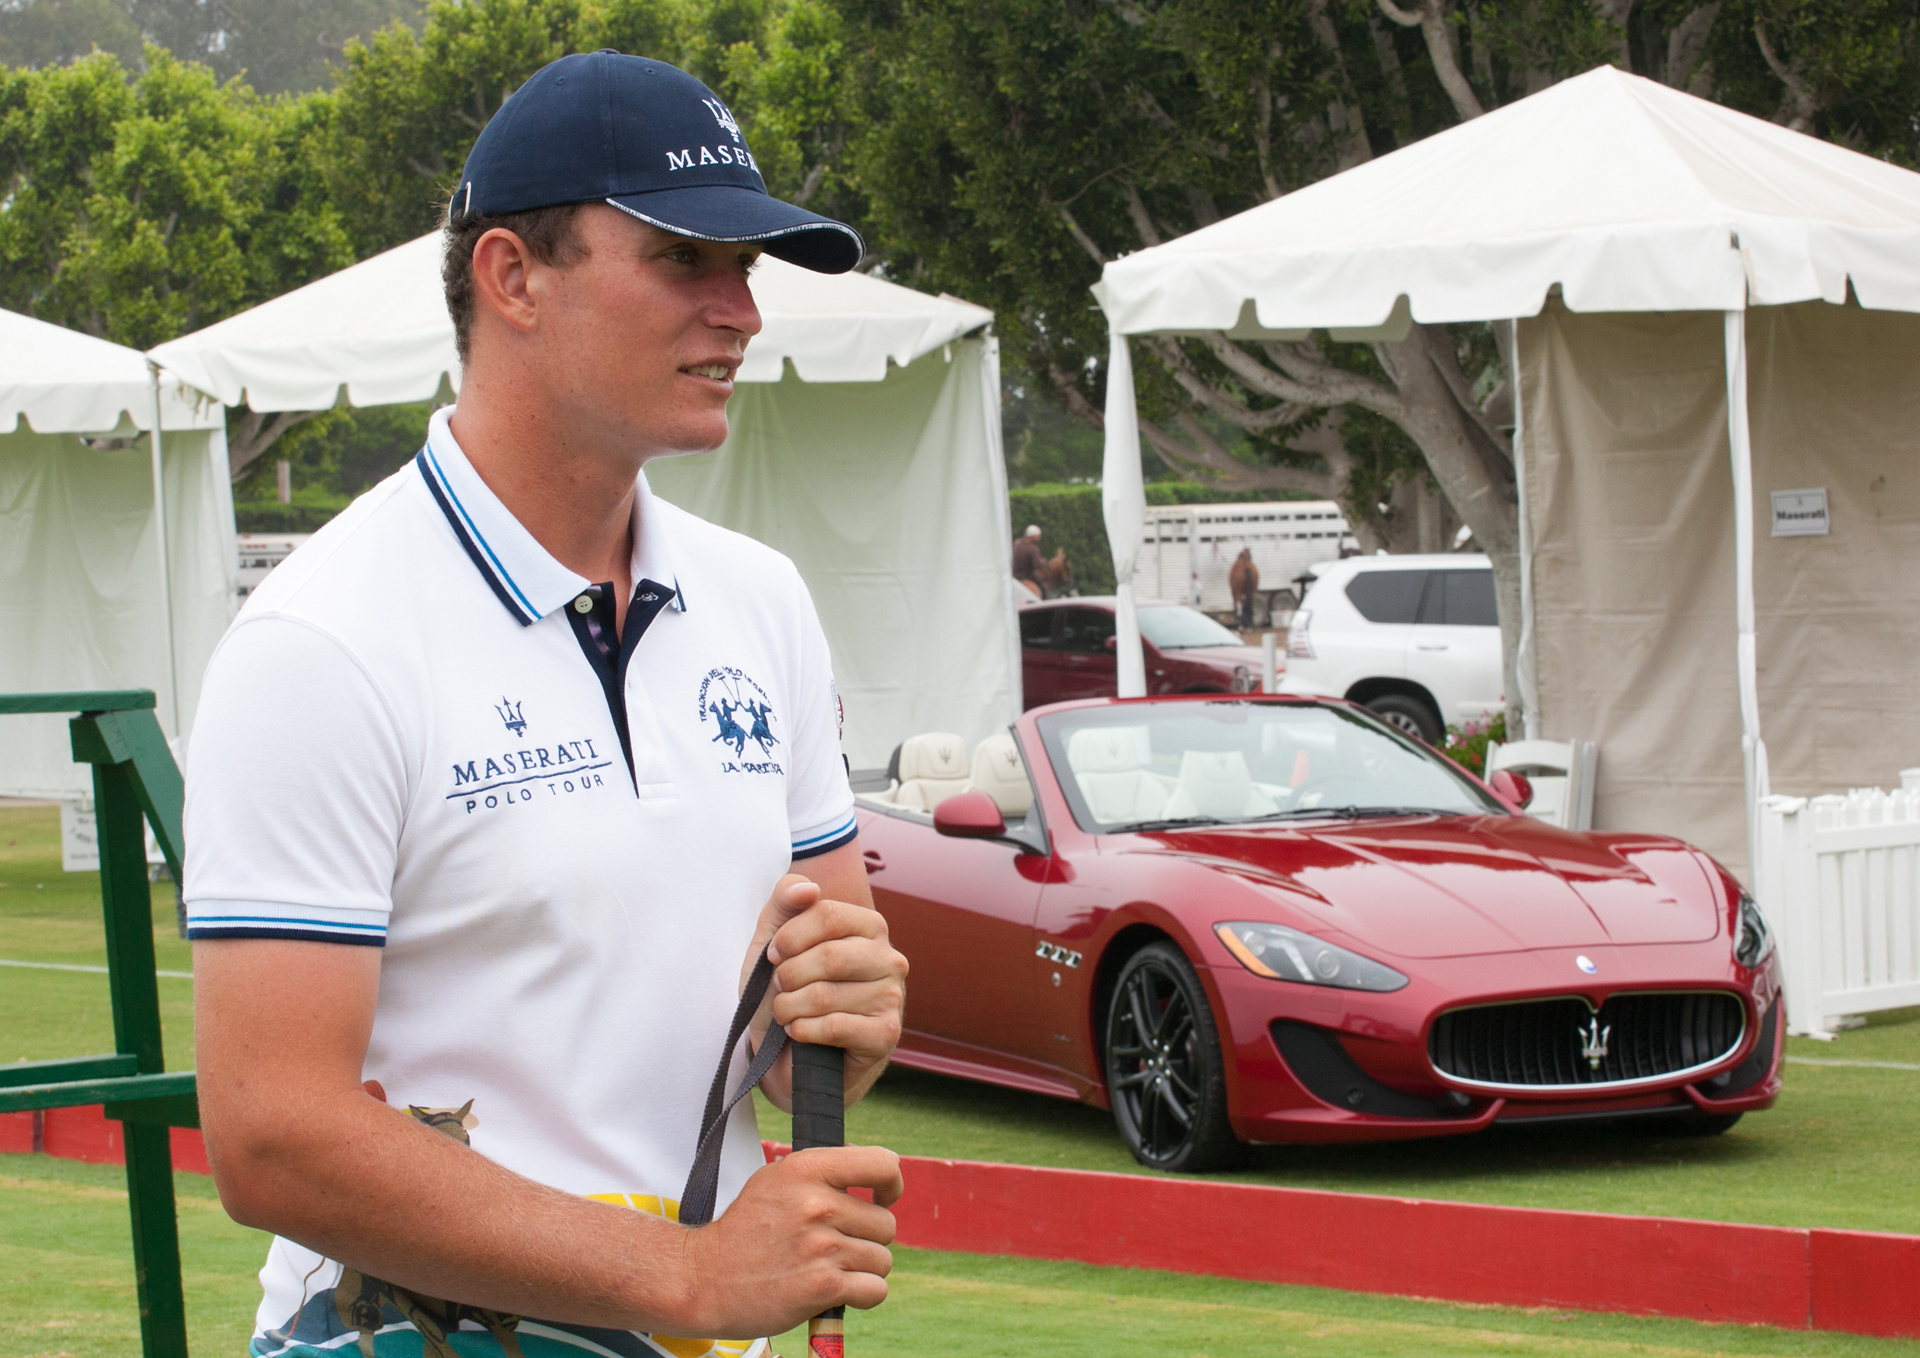 2016 Maserati Silver Cup - Jesse Bray © Fiat Chrysler Automobiles N.V.